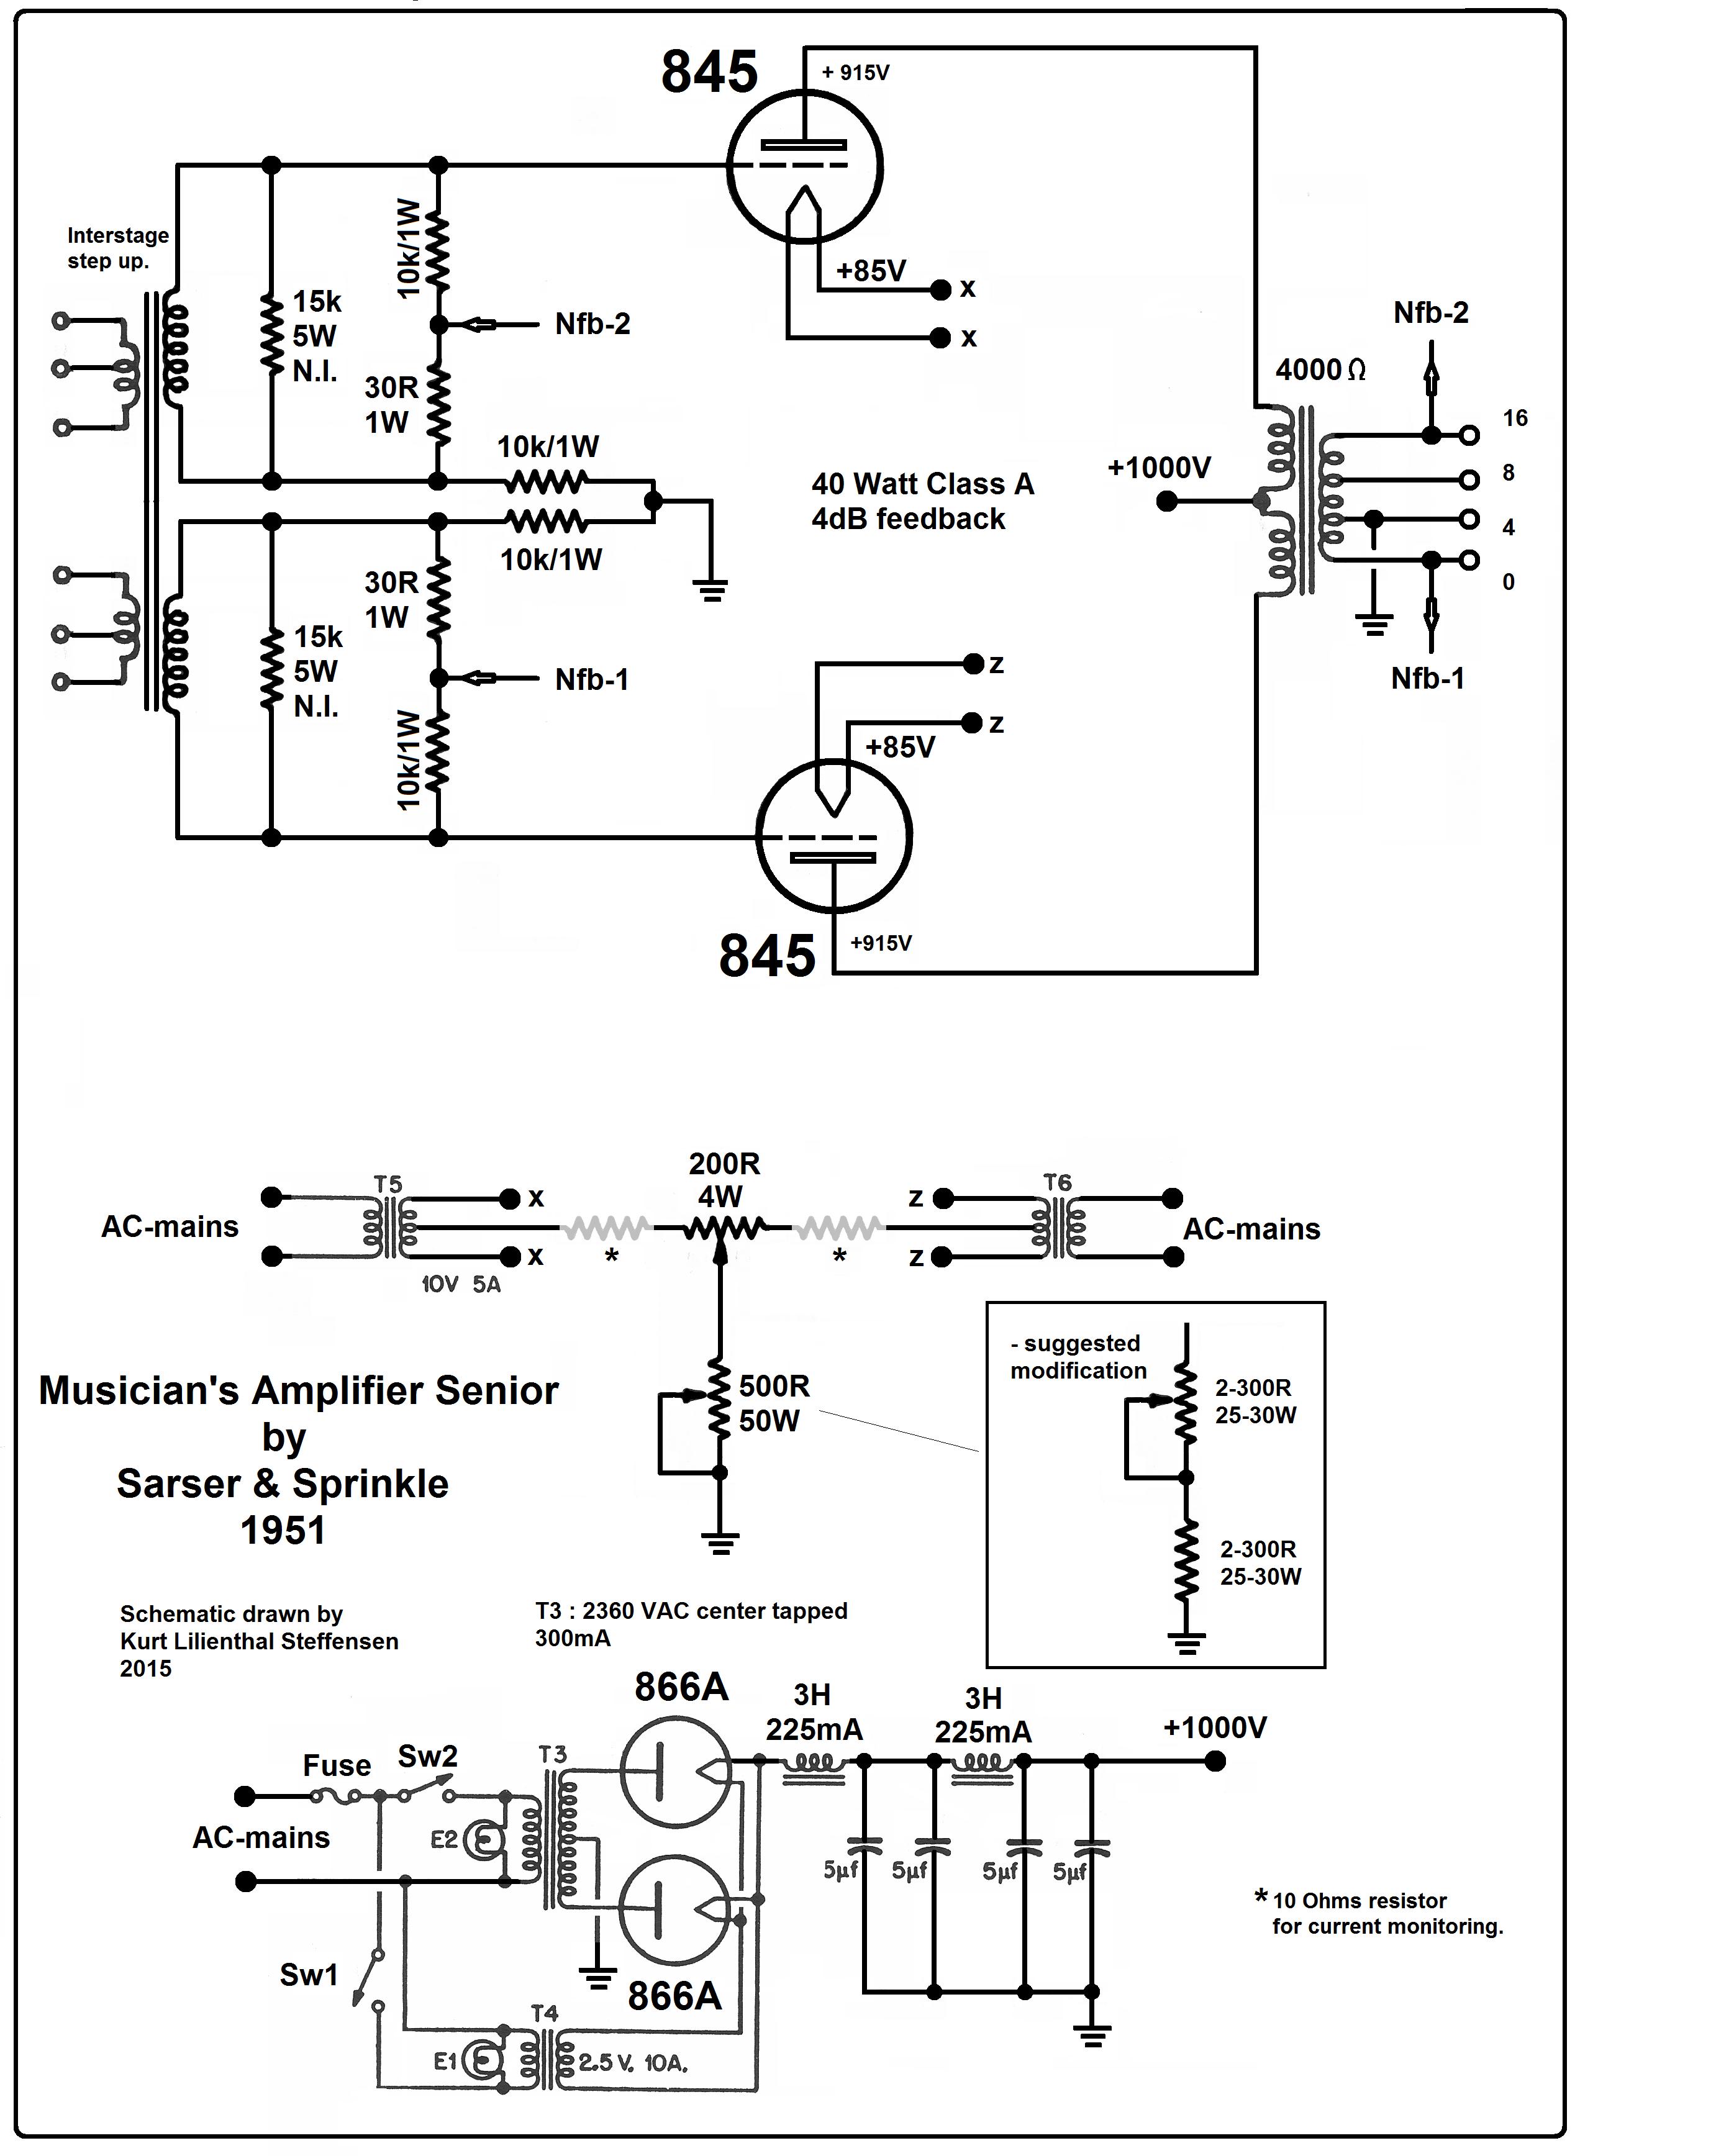 Musicians amplifier Senior, 845 PP, Sarser & Sprinkle, 1951, ed